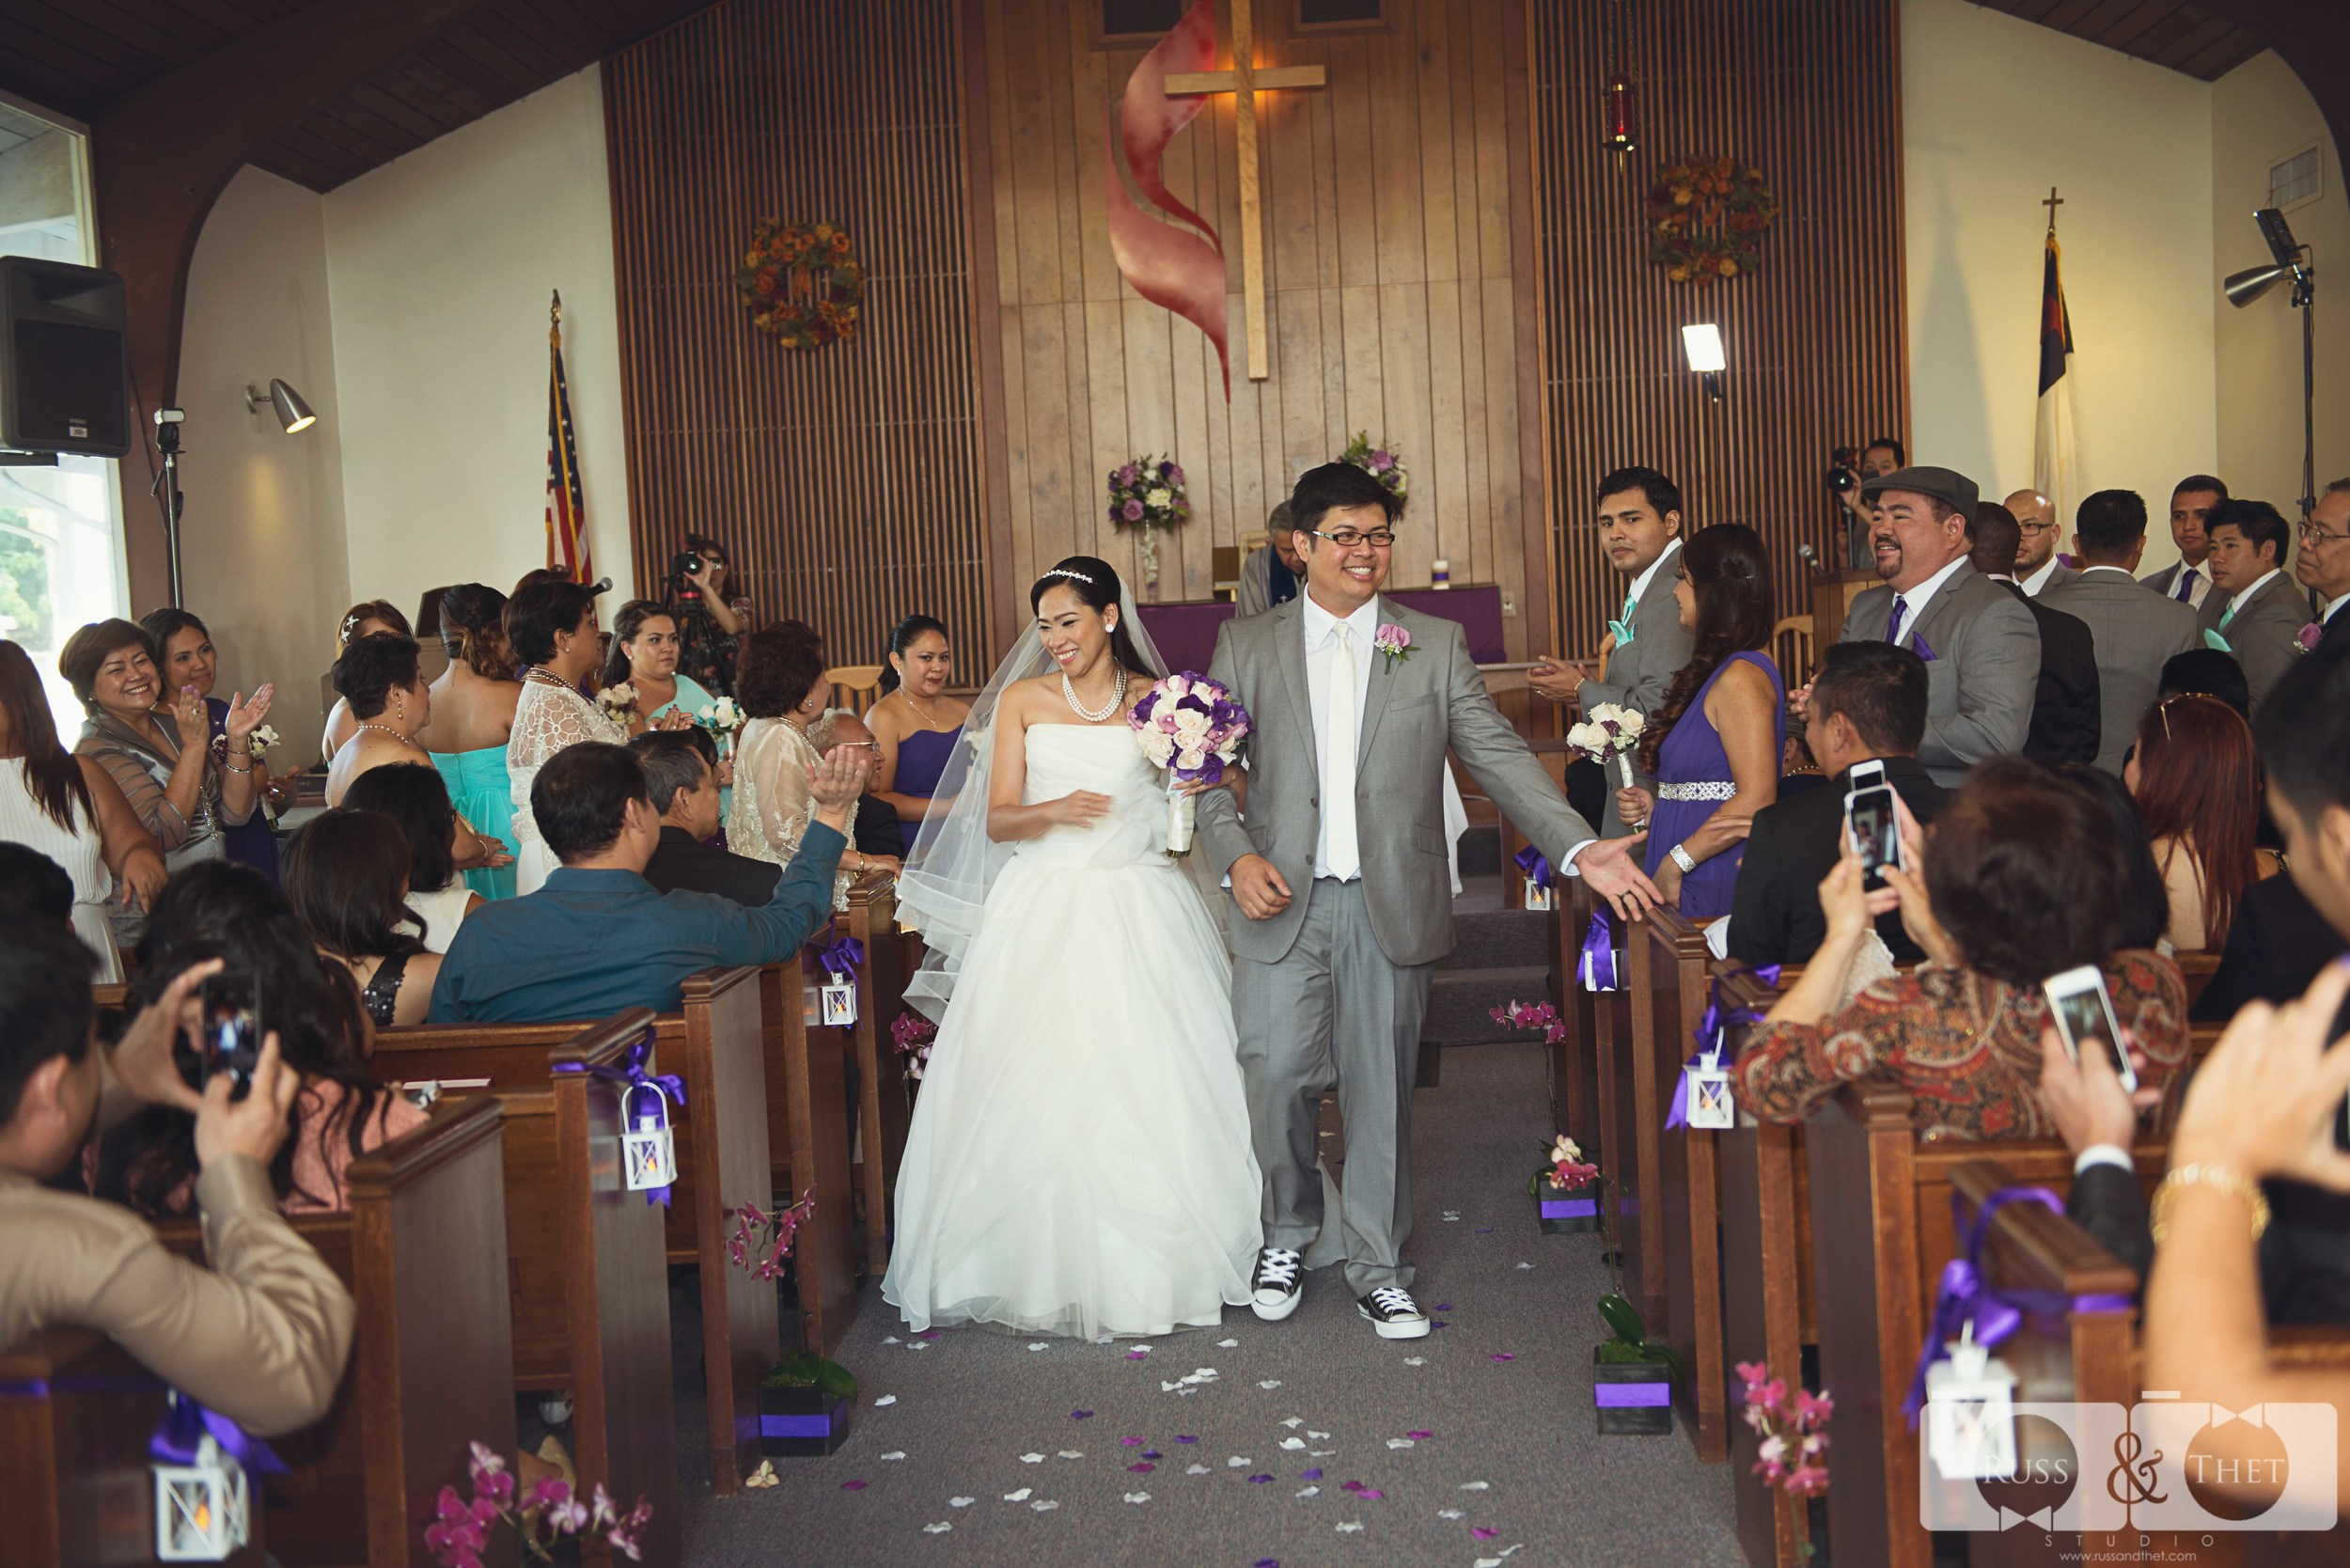 royal-palace-banquet-hall-glendale-wedding-41.JPG